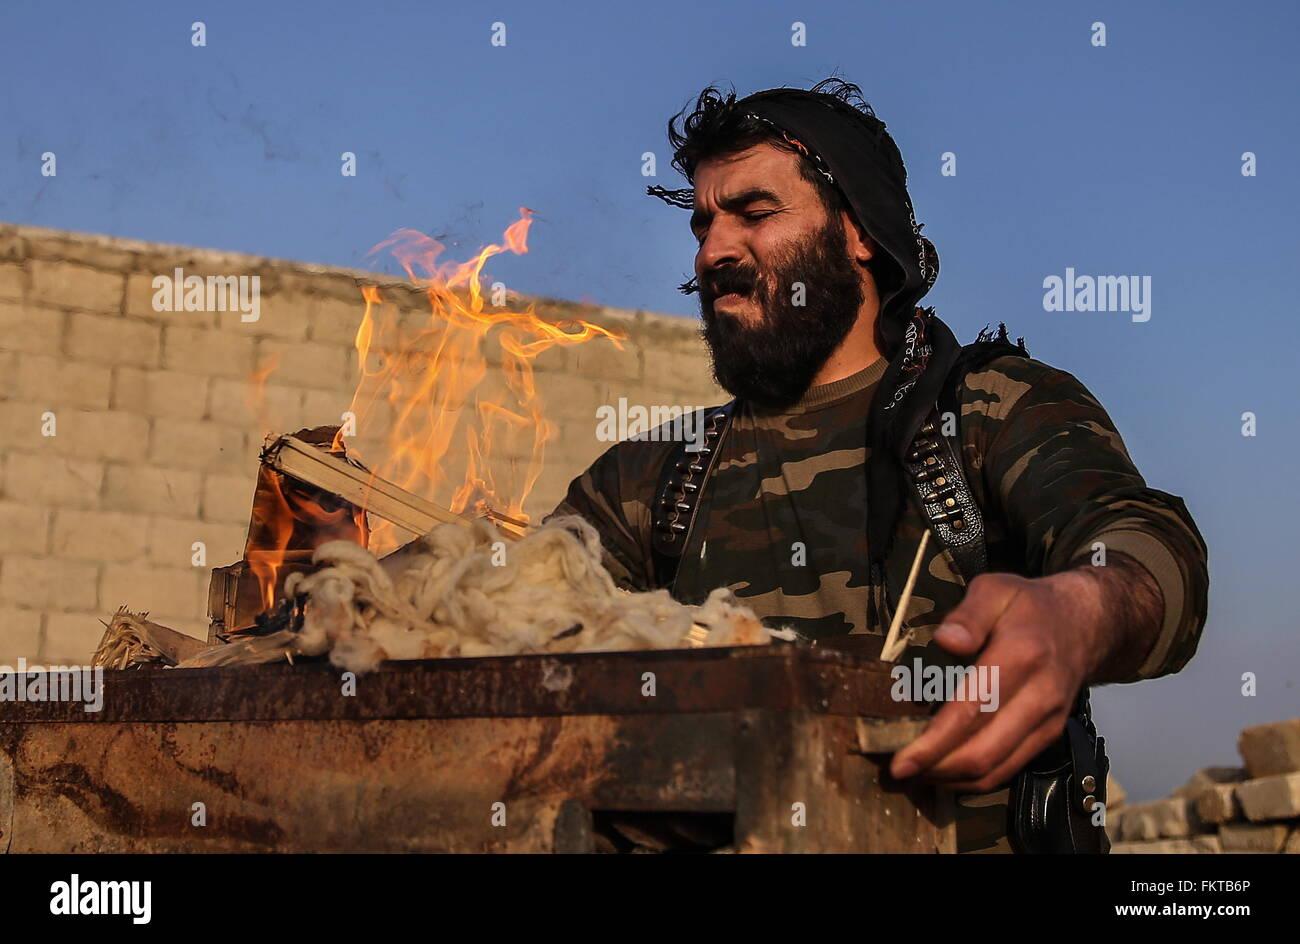 SYRIA. MARCH 10, 2016. Abu Juma, a commander of a Jaysh al-Thuwar unit, near the town of Azaz. Jaysh al-Thuwar, Stock Photo